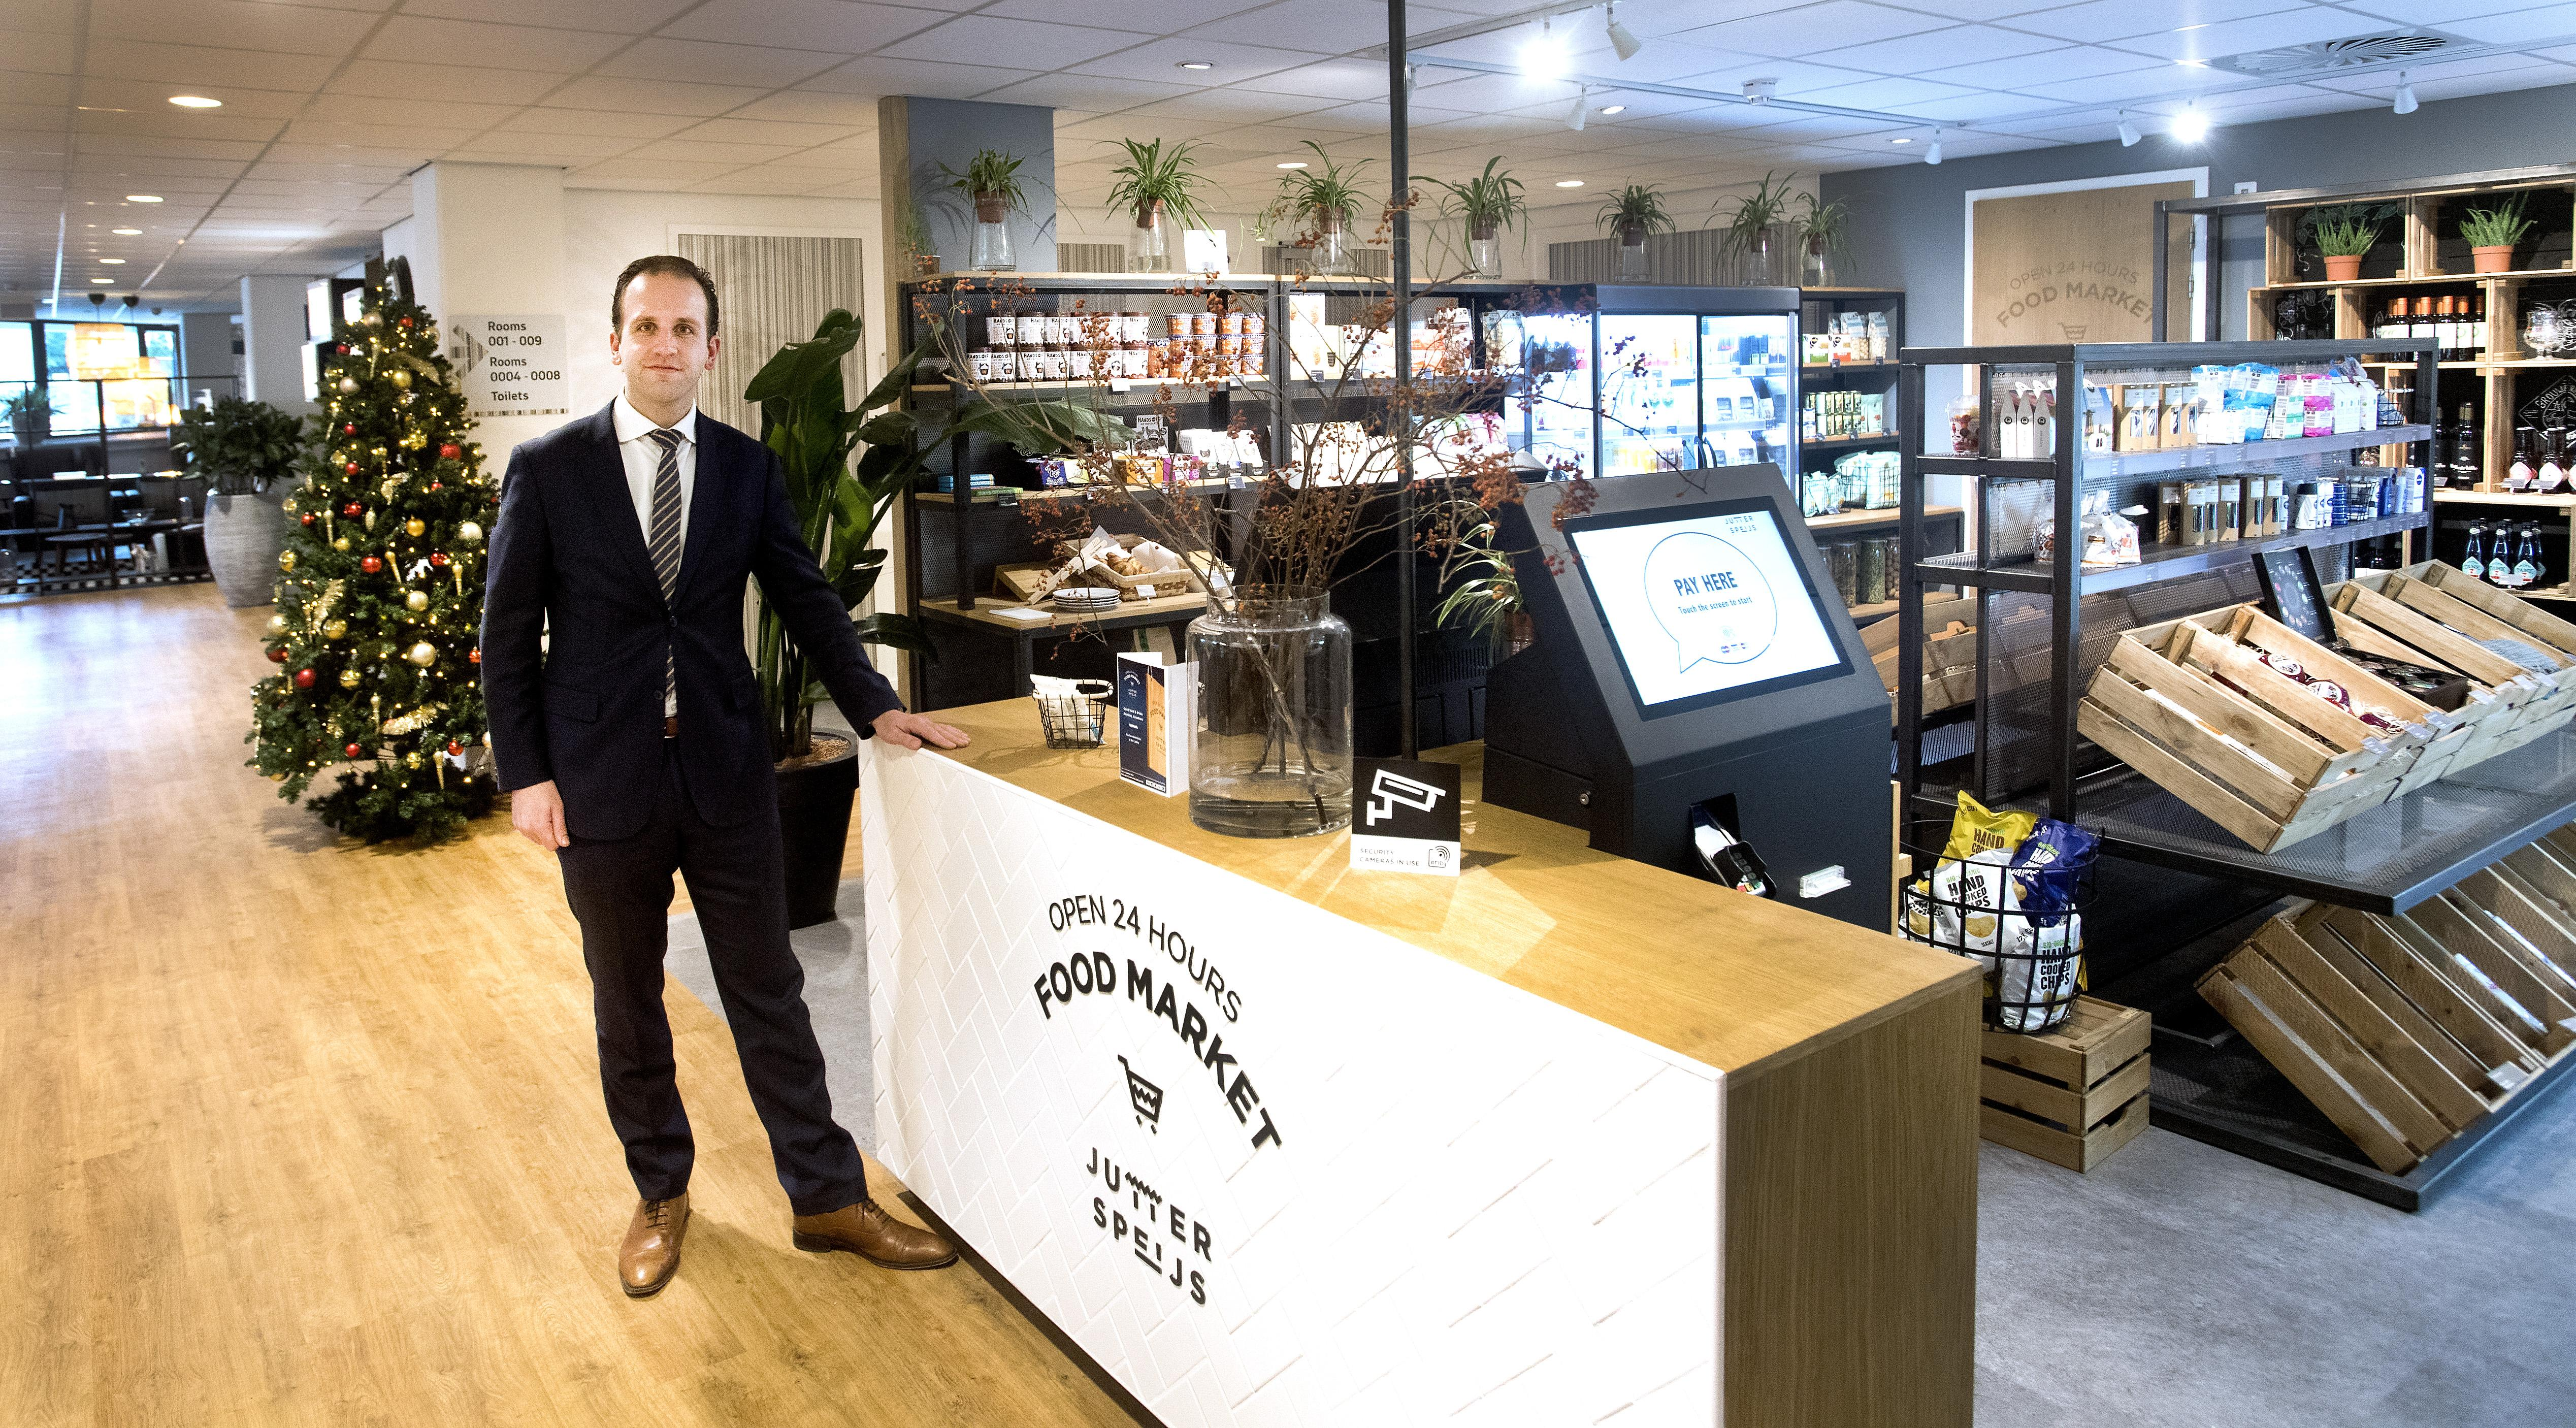 'We hebben er nu wel genoeg': Rem op aantal hotels in Haarlemmermeer